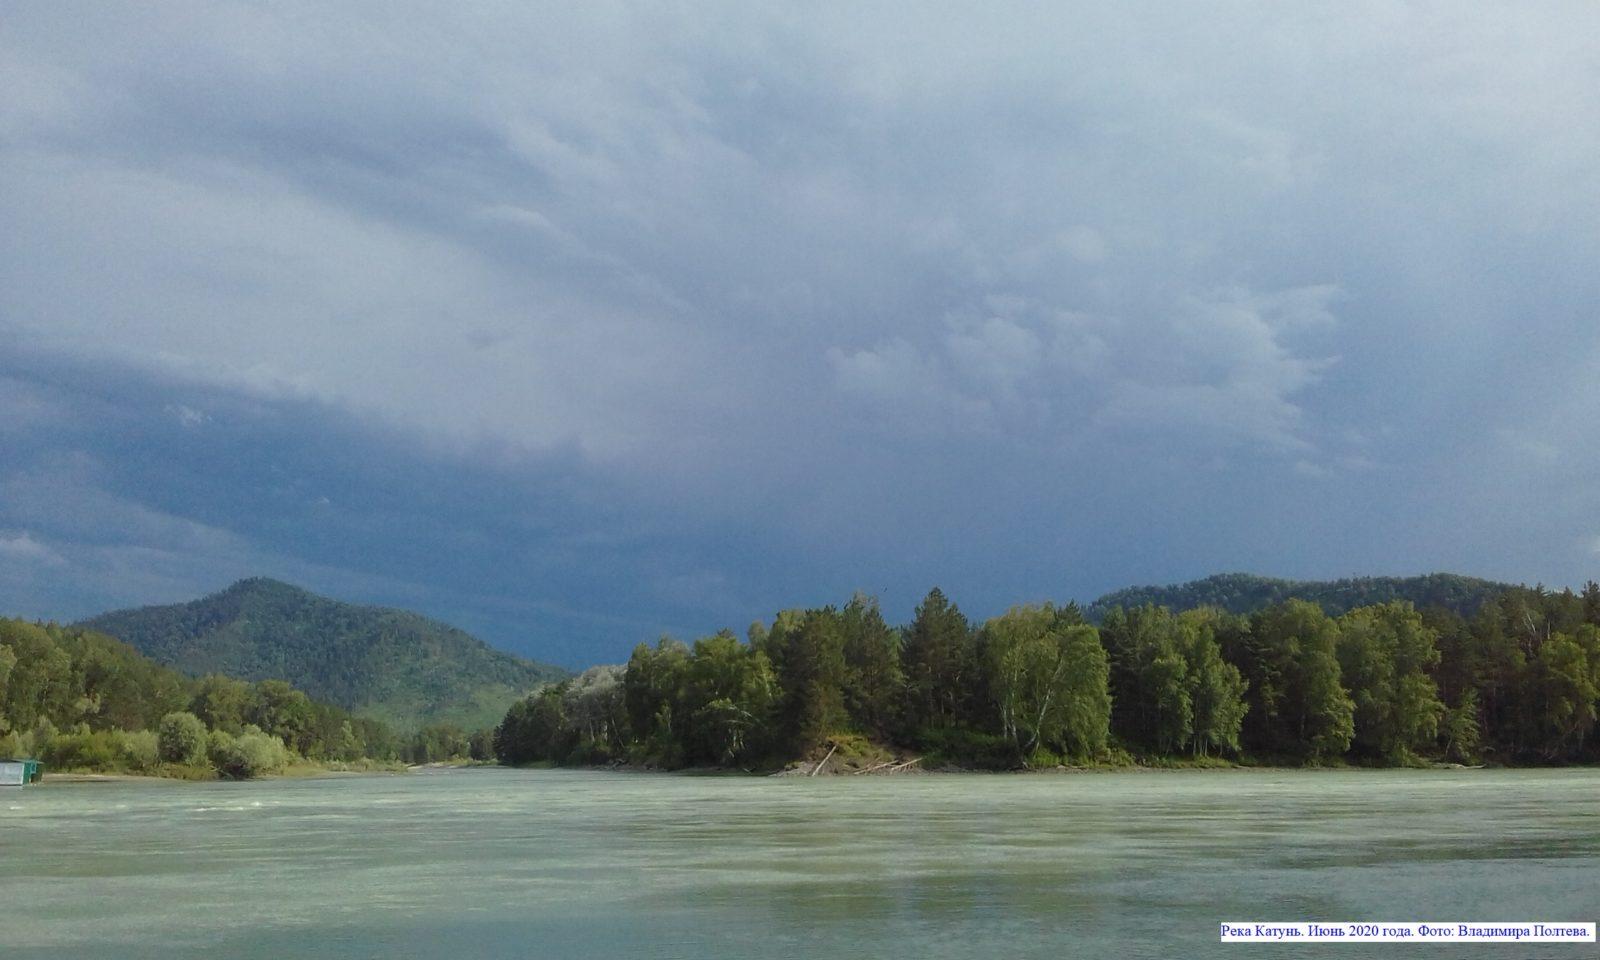 Река Катунь. Июнь 2020 года.